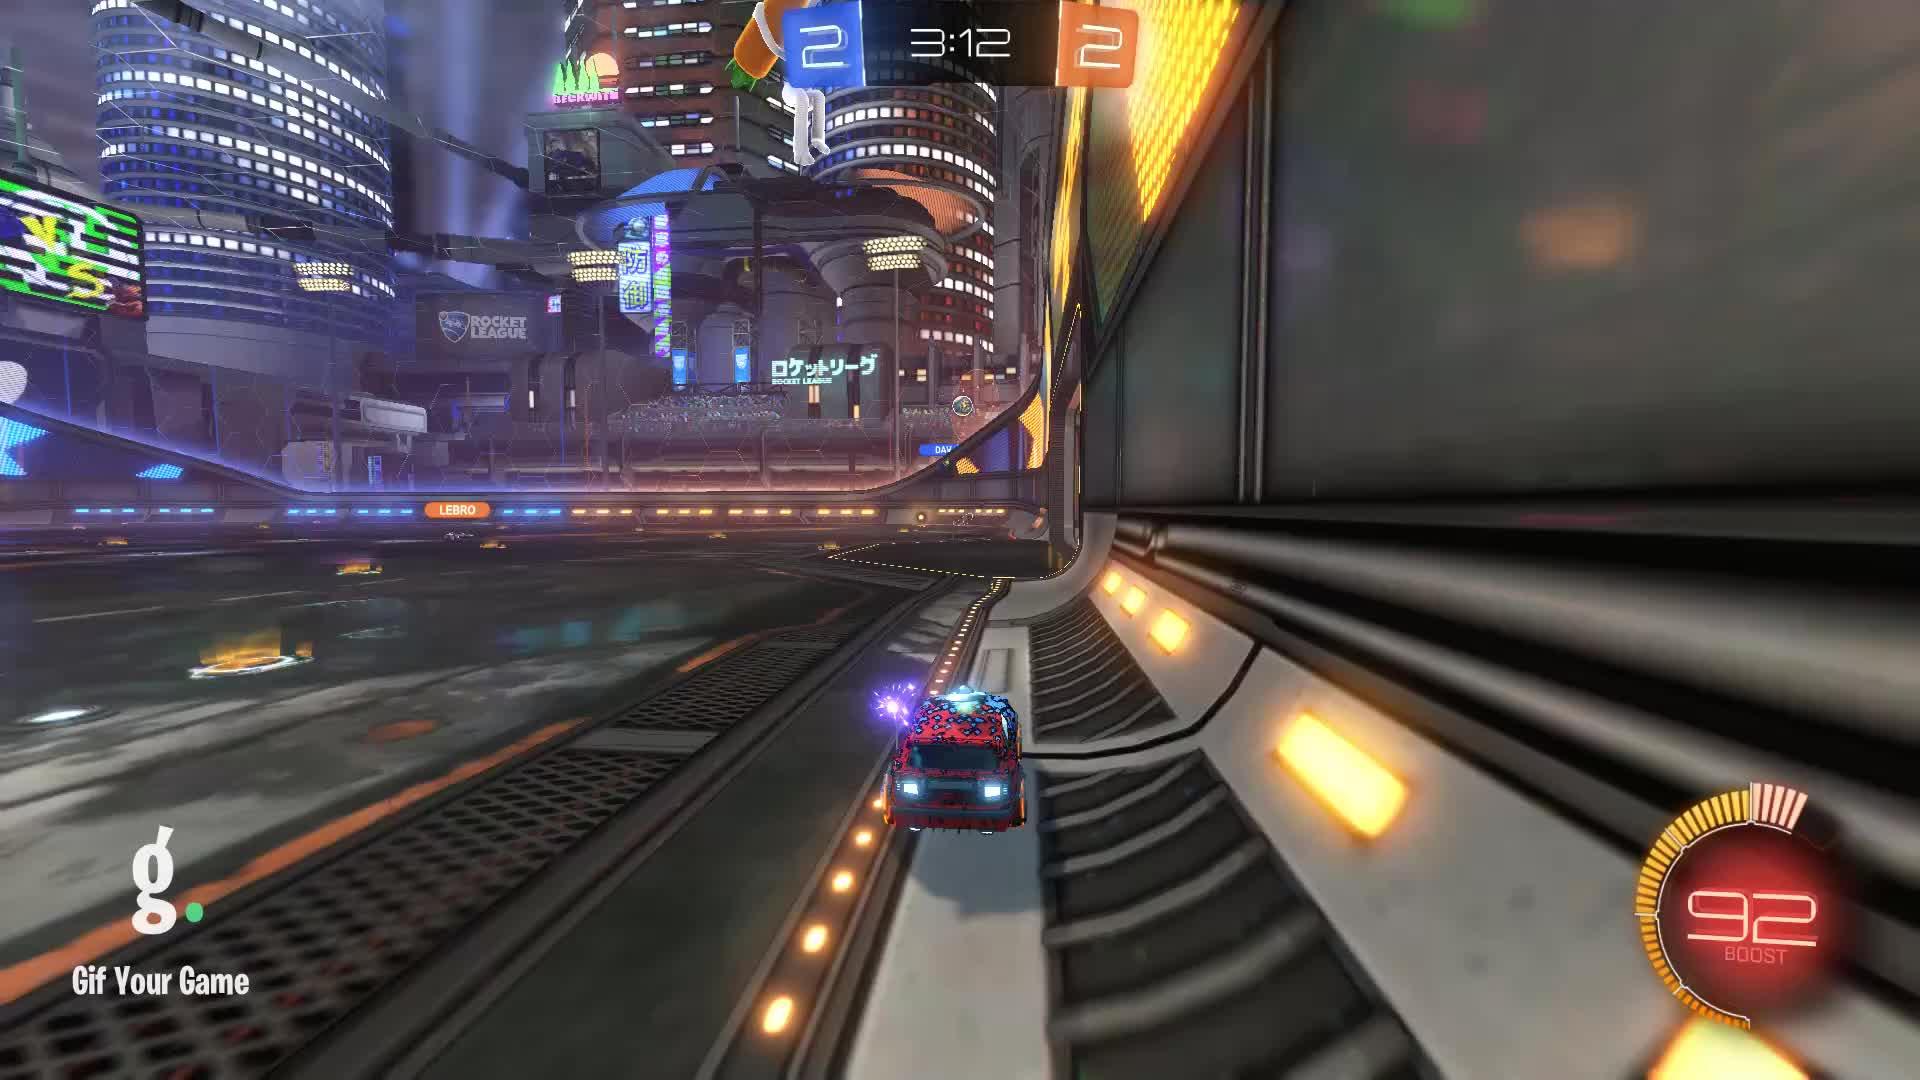 Gif Your Game, GifYourGame, Goal, LordTempestX, Rocket League, RocketLeague, Goal 5: LordTempestX GIFs